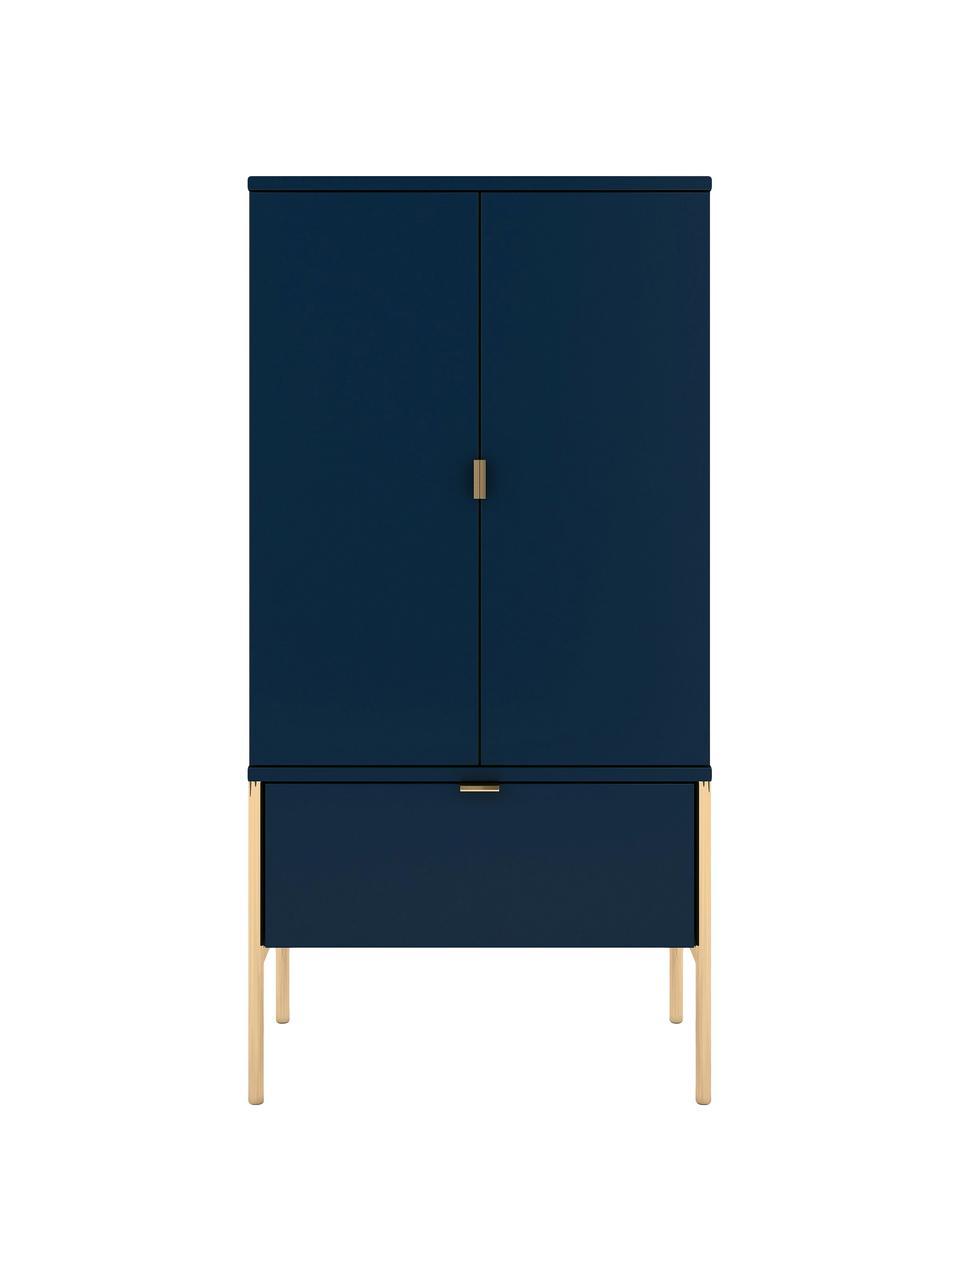 Donkerblauw dressoir Polka met deurtjes, Frame: gelamineerd vezelplaat me, Donkerblauw, 60 x 120 cm